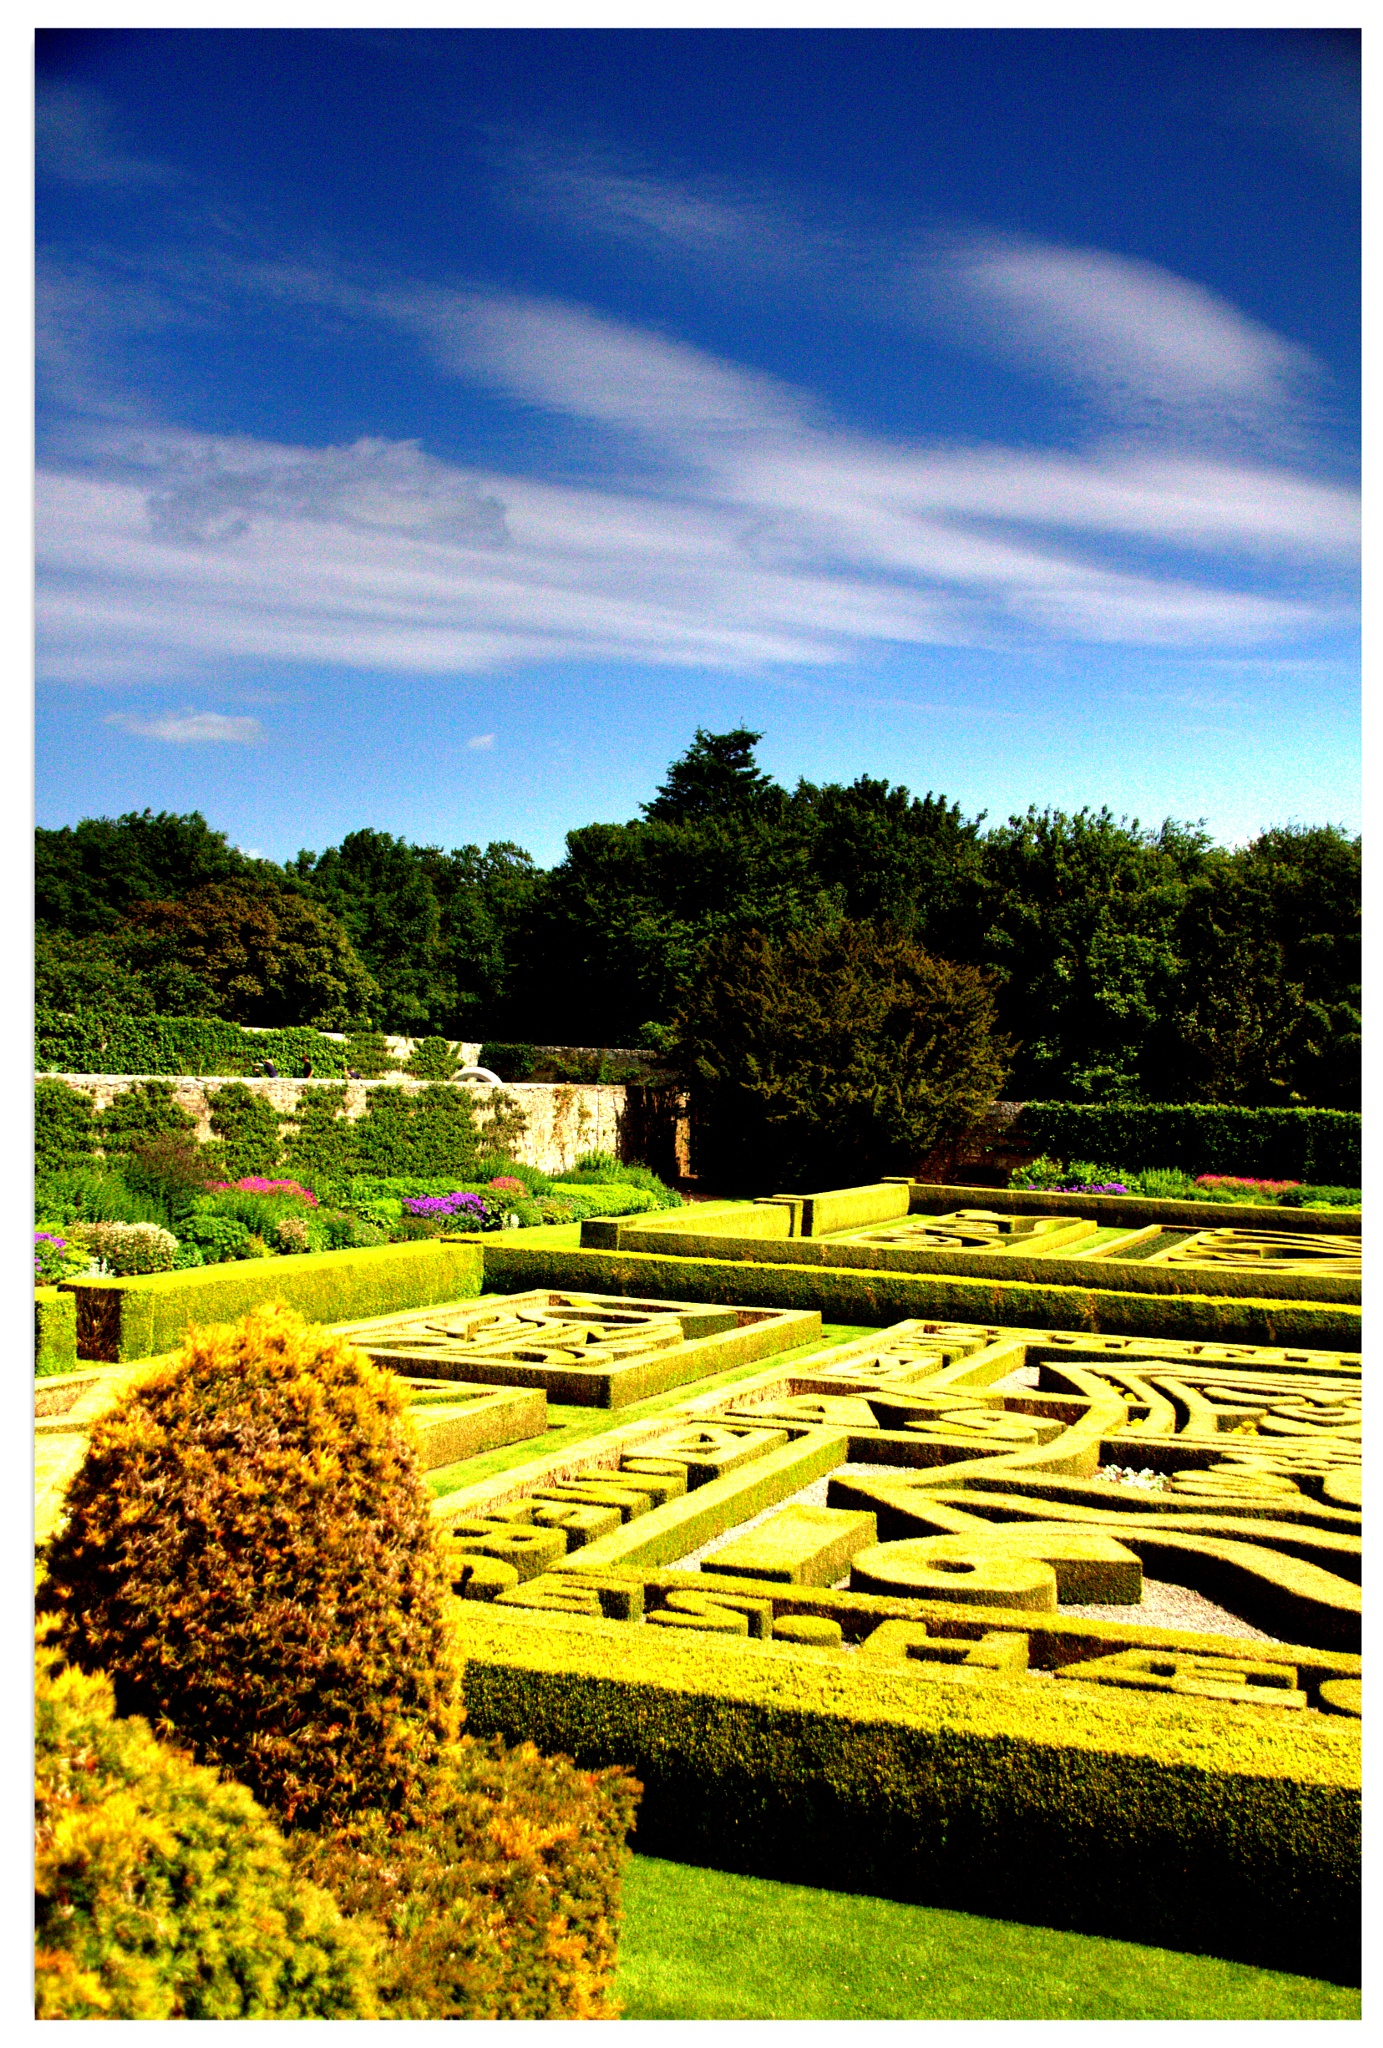 Pitmedden Gardens by Marf